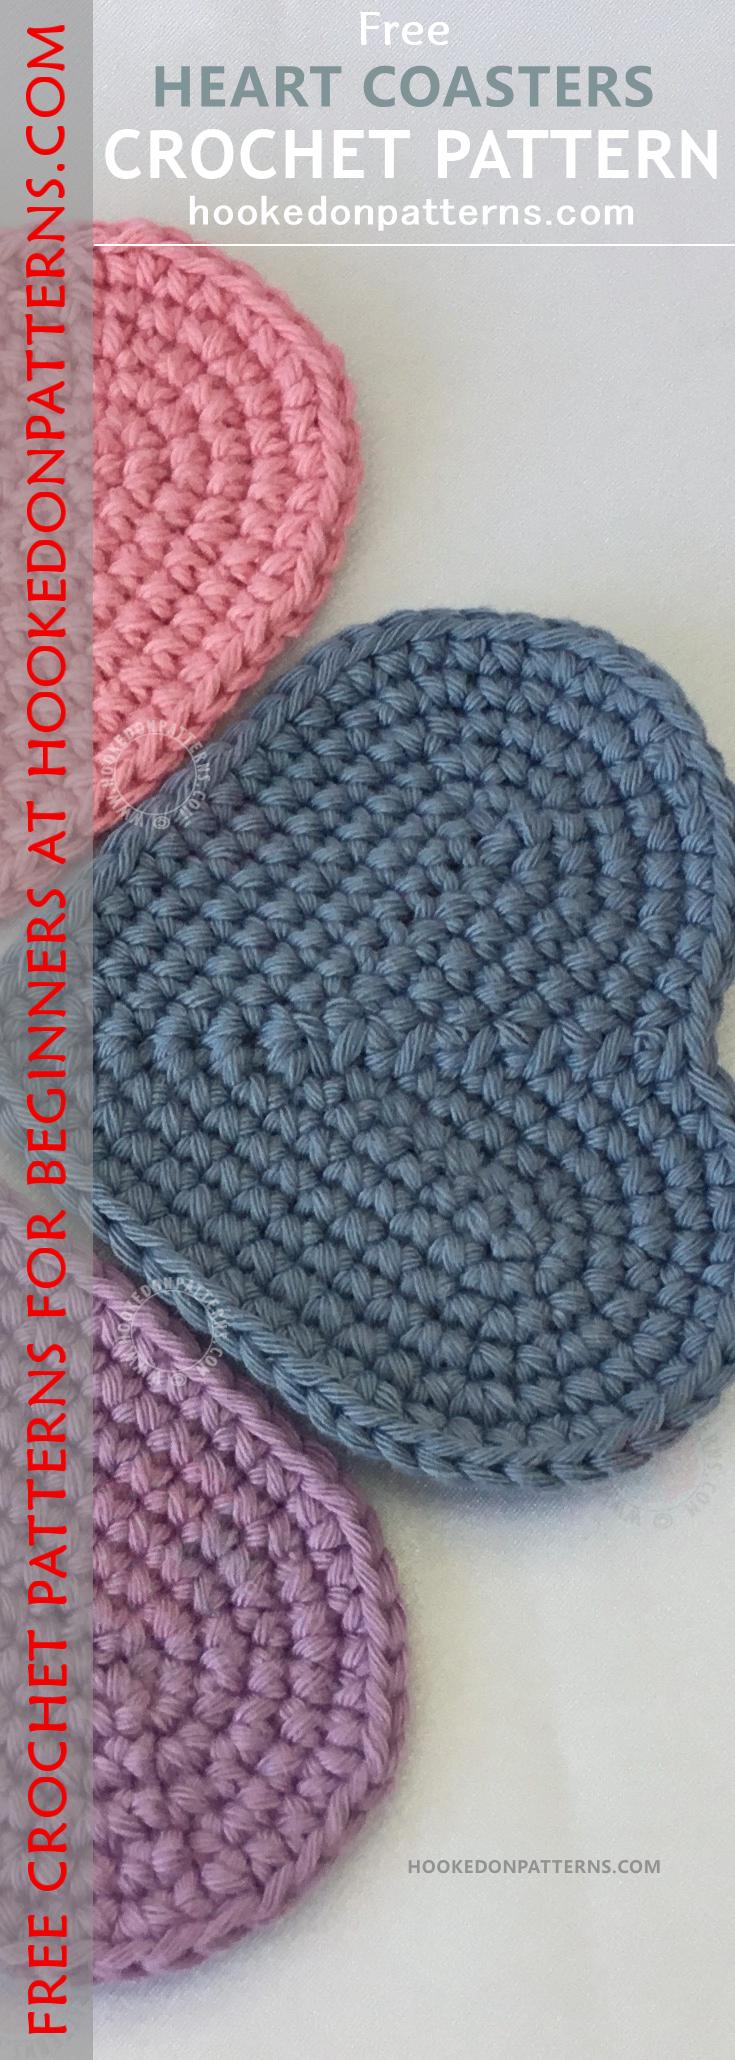 Free Heart Coaster Crochet Pattern | Pinterest | Crochet coaster ...